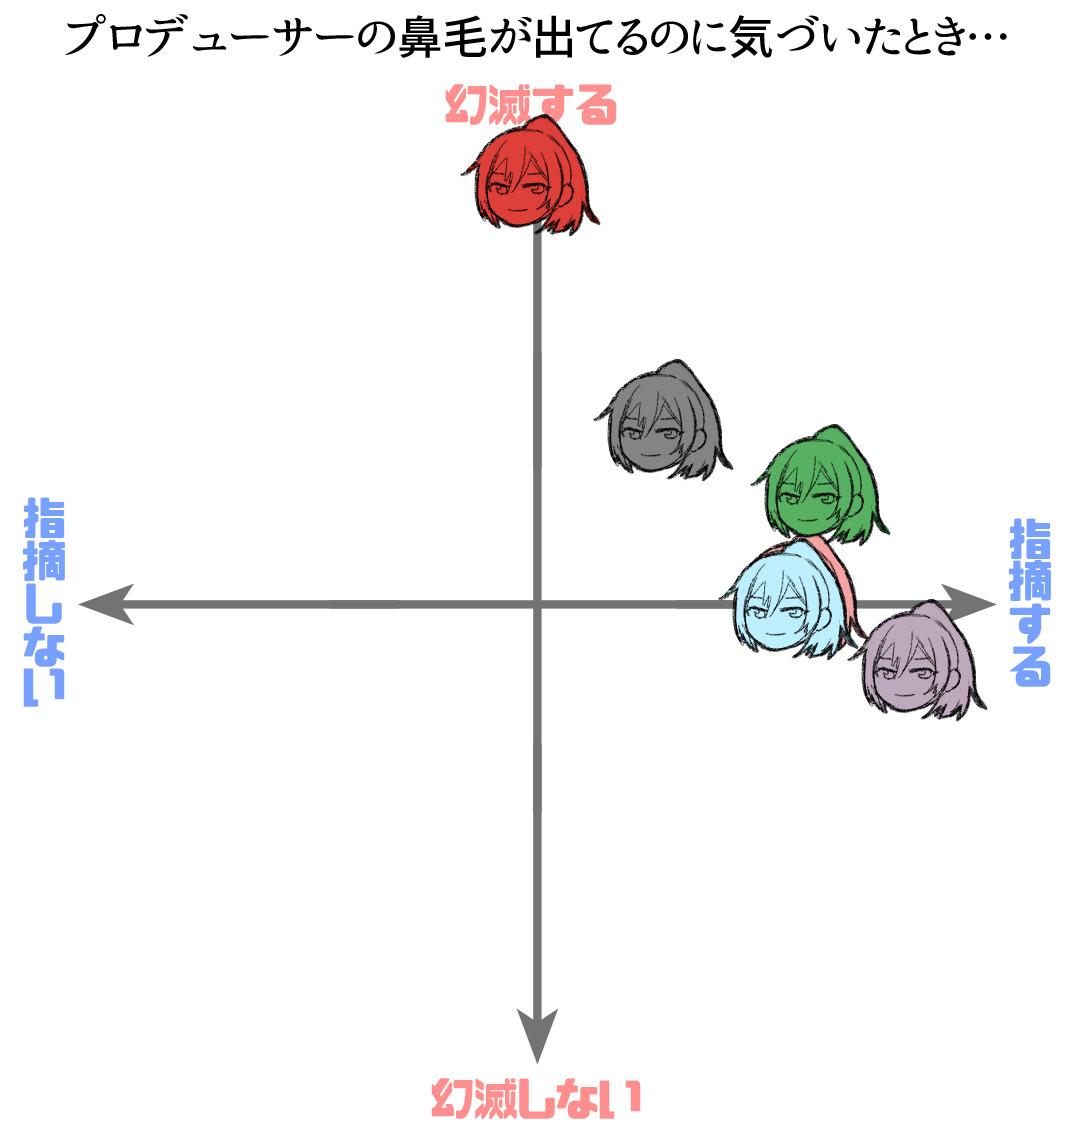 f:id:hoshi_sano:20200414111552j:image:w400